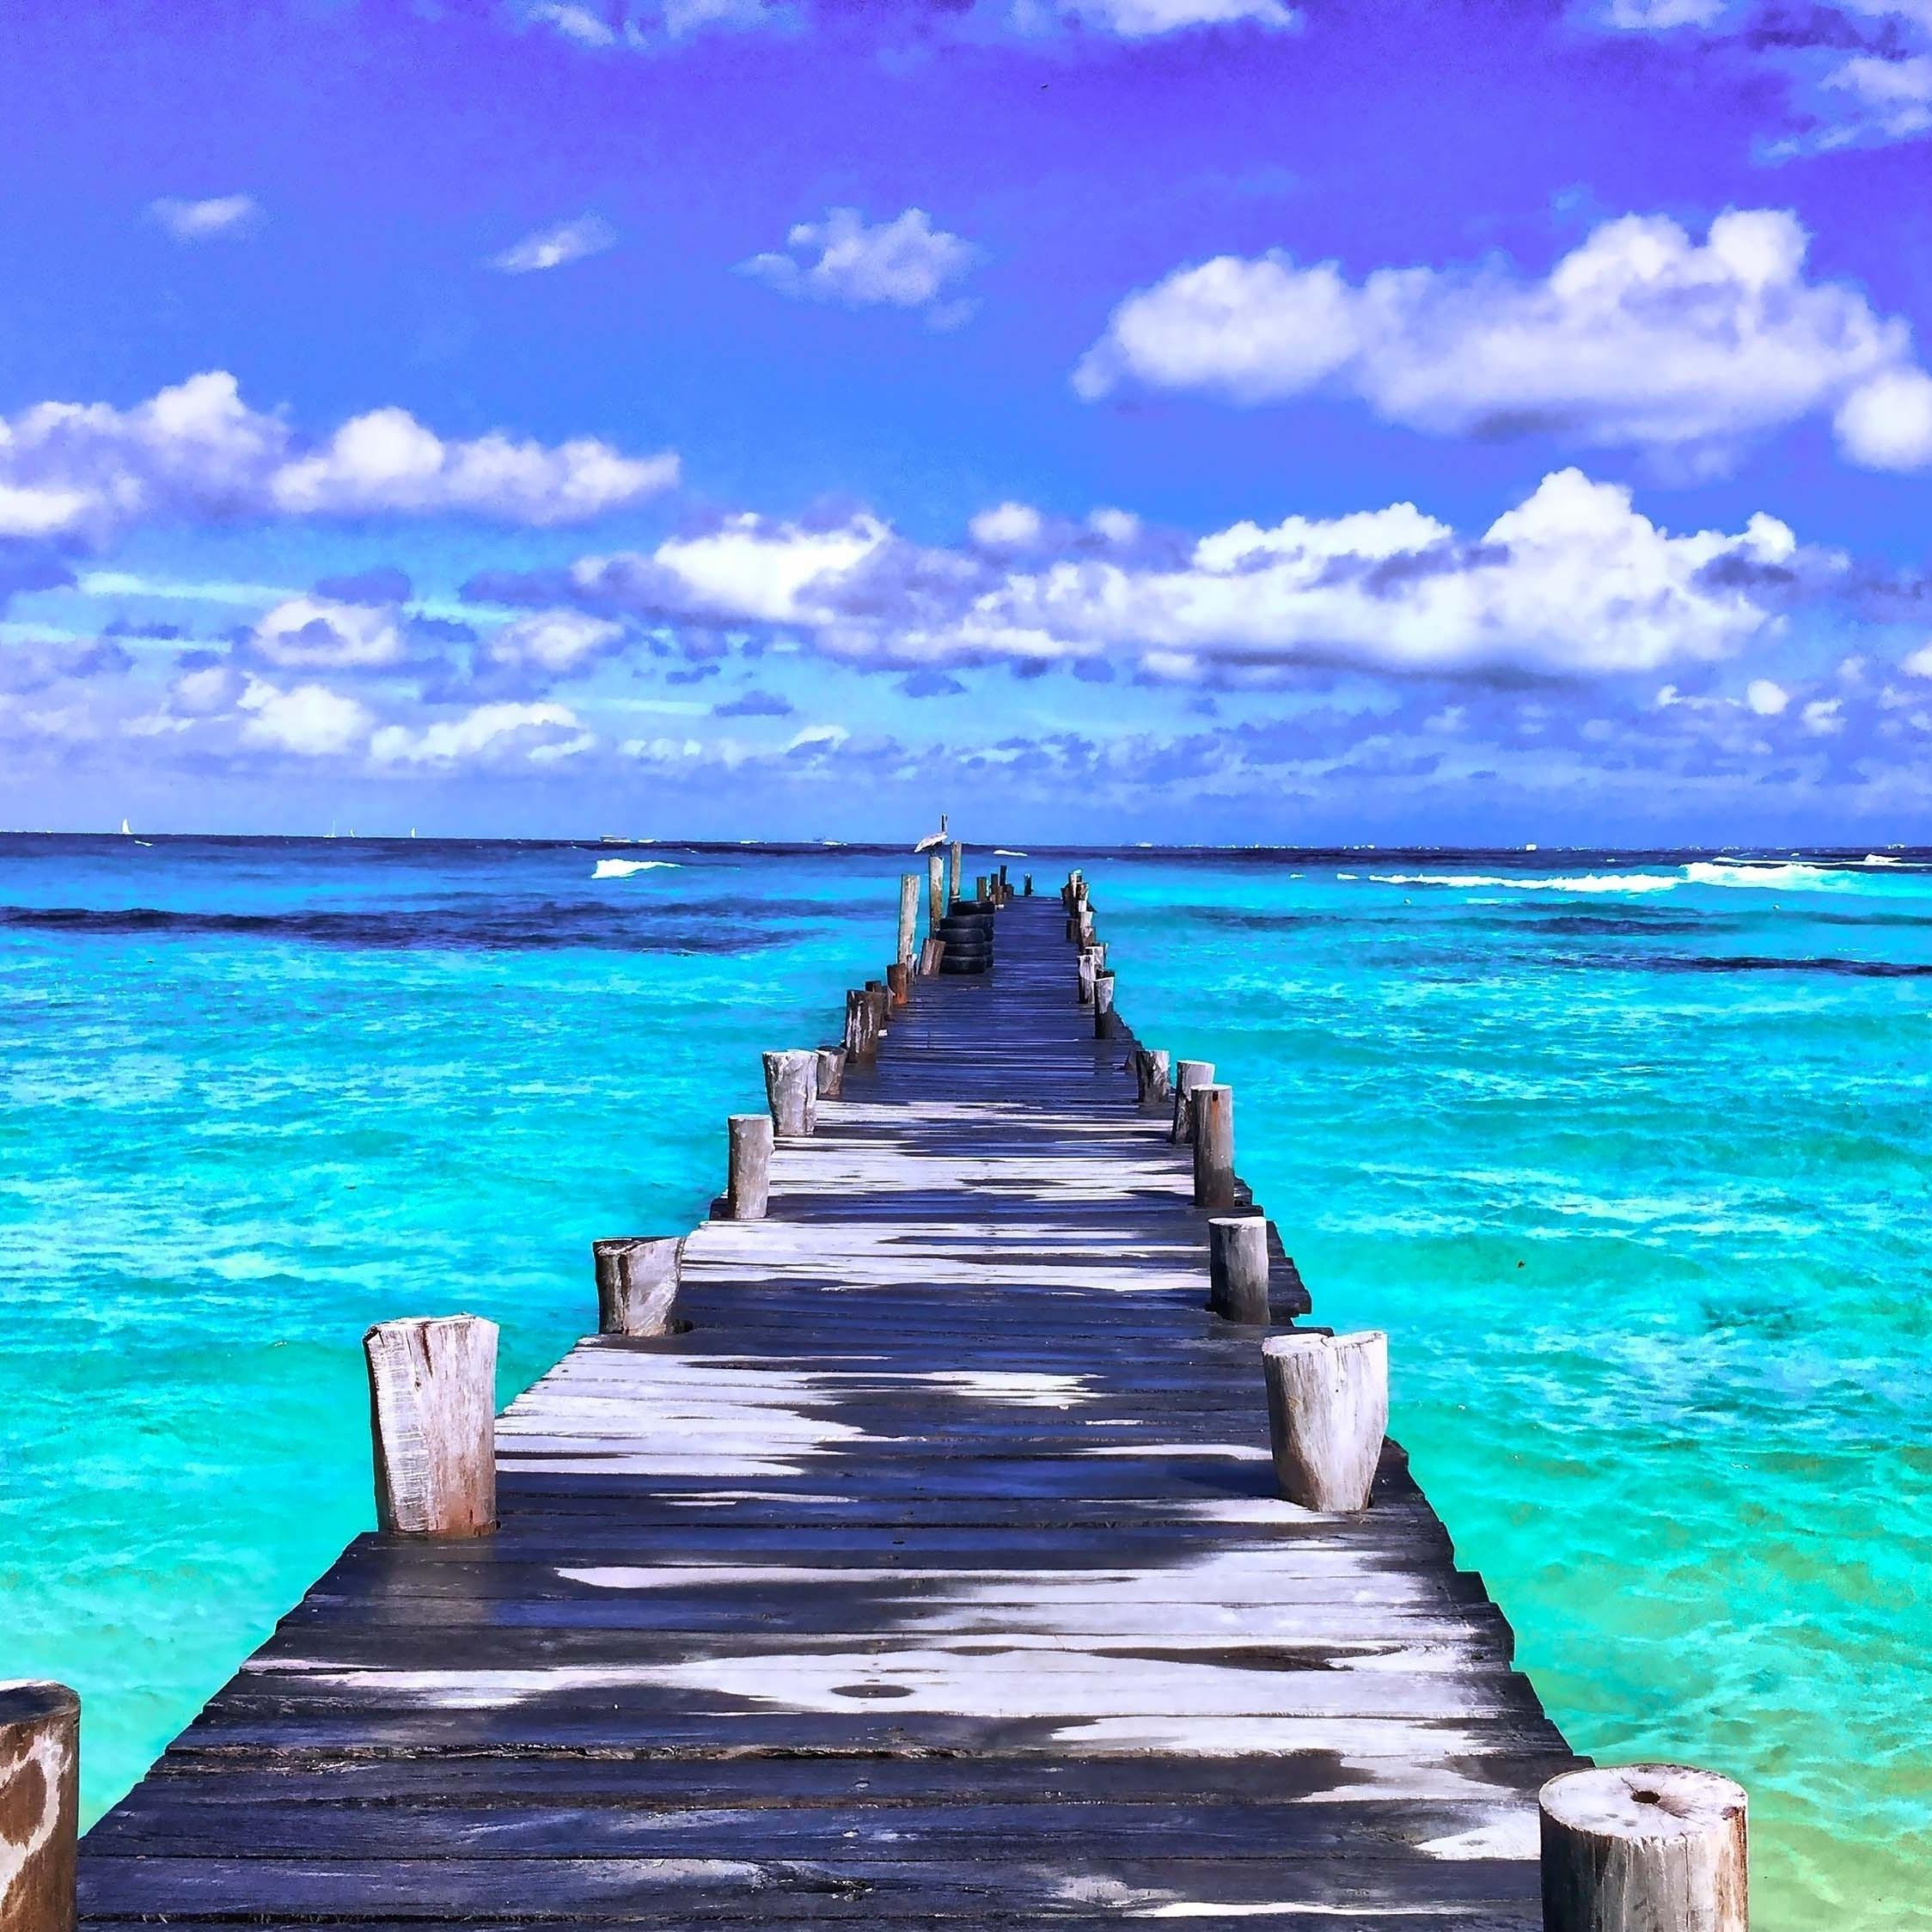 Download 2248x2248 Wallpaper Pier Sunny Day Beach Ipad